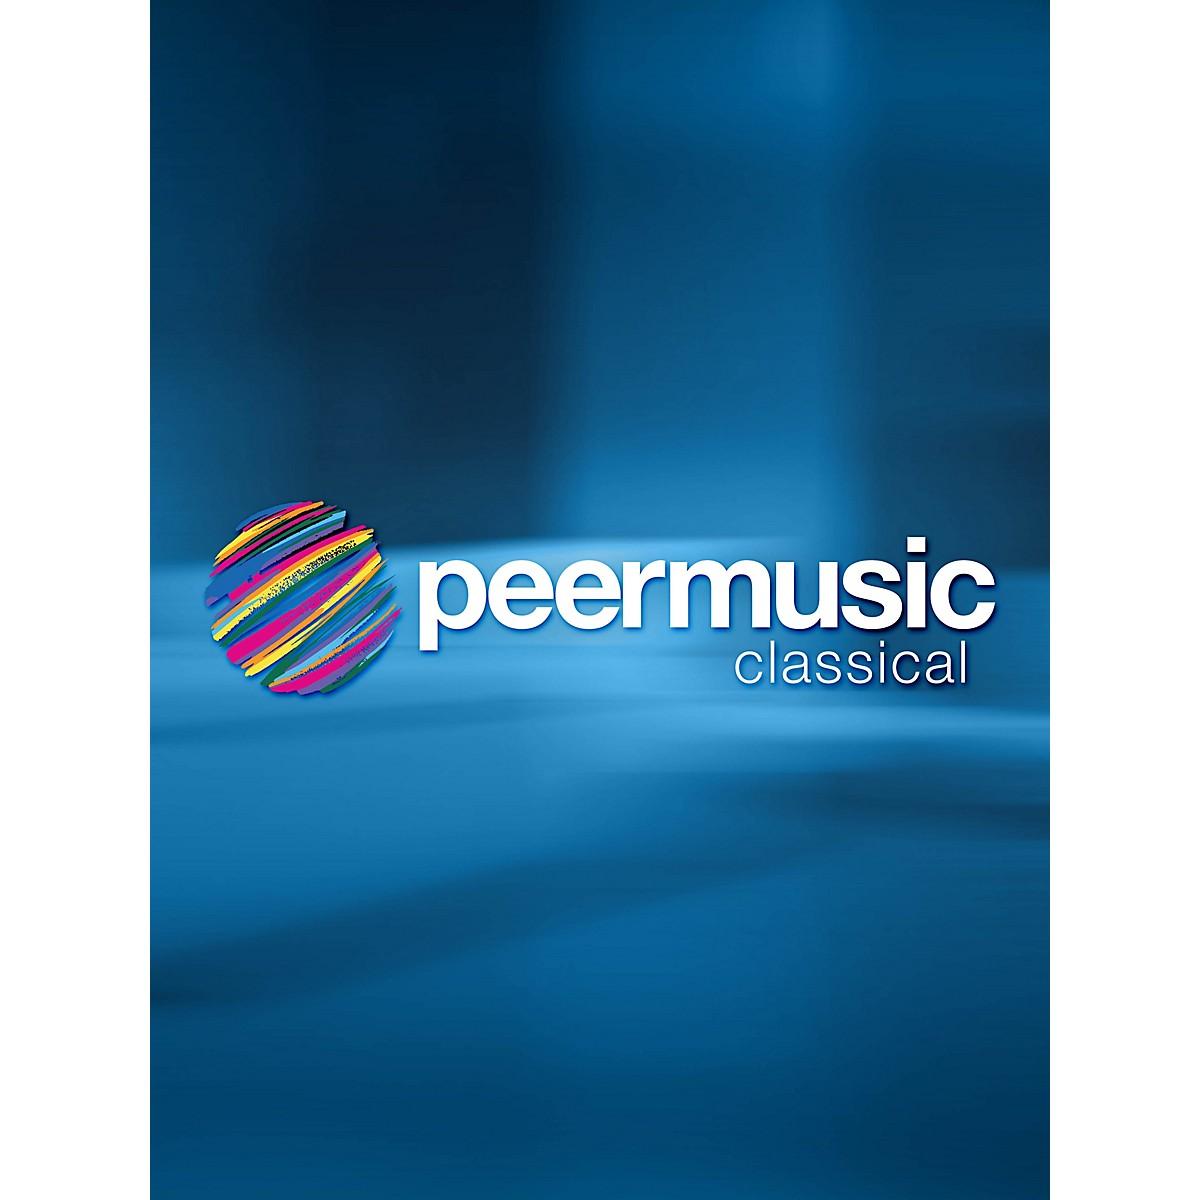 Peer Music Conga del Fuego Nuevo - for Symphonic Band - Full Score Peermusic Classical Series by Arturo Marquez